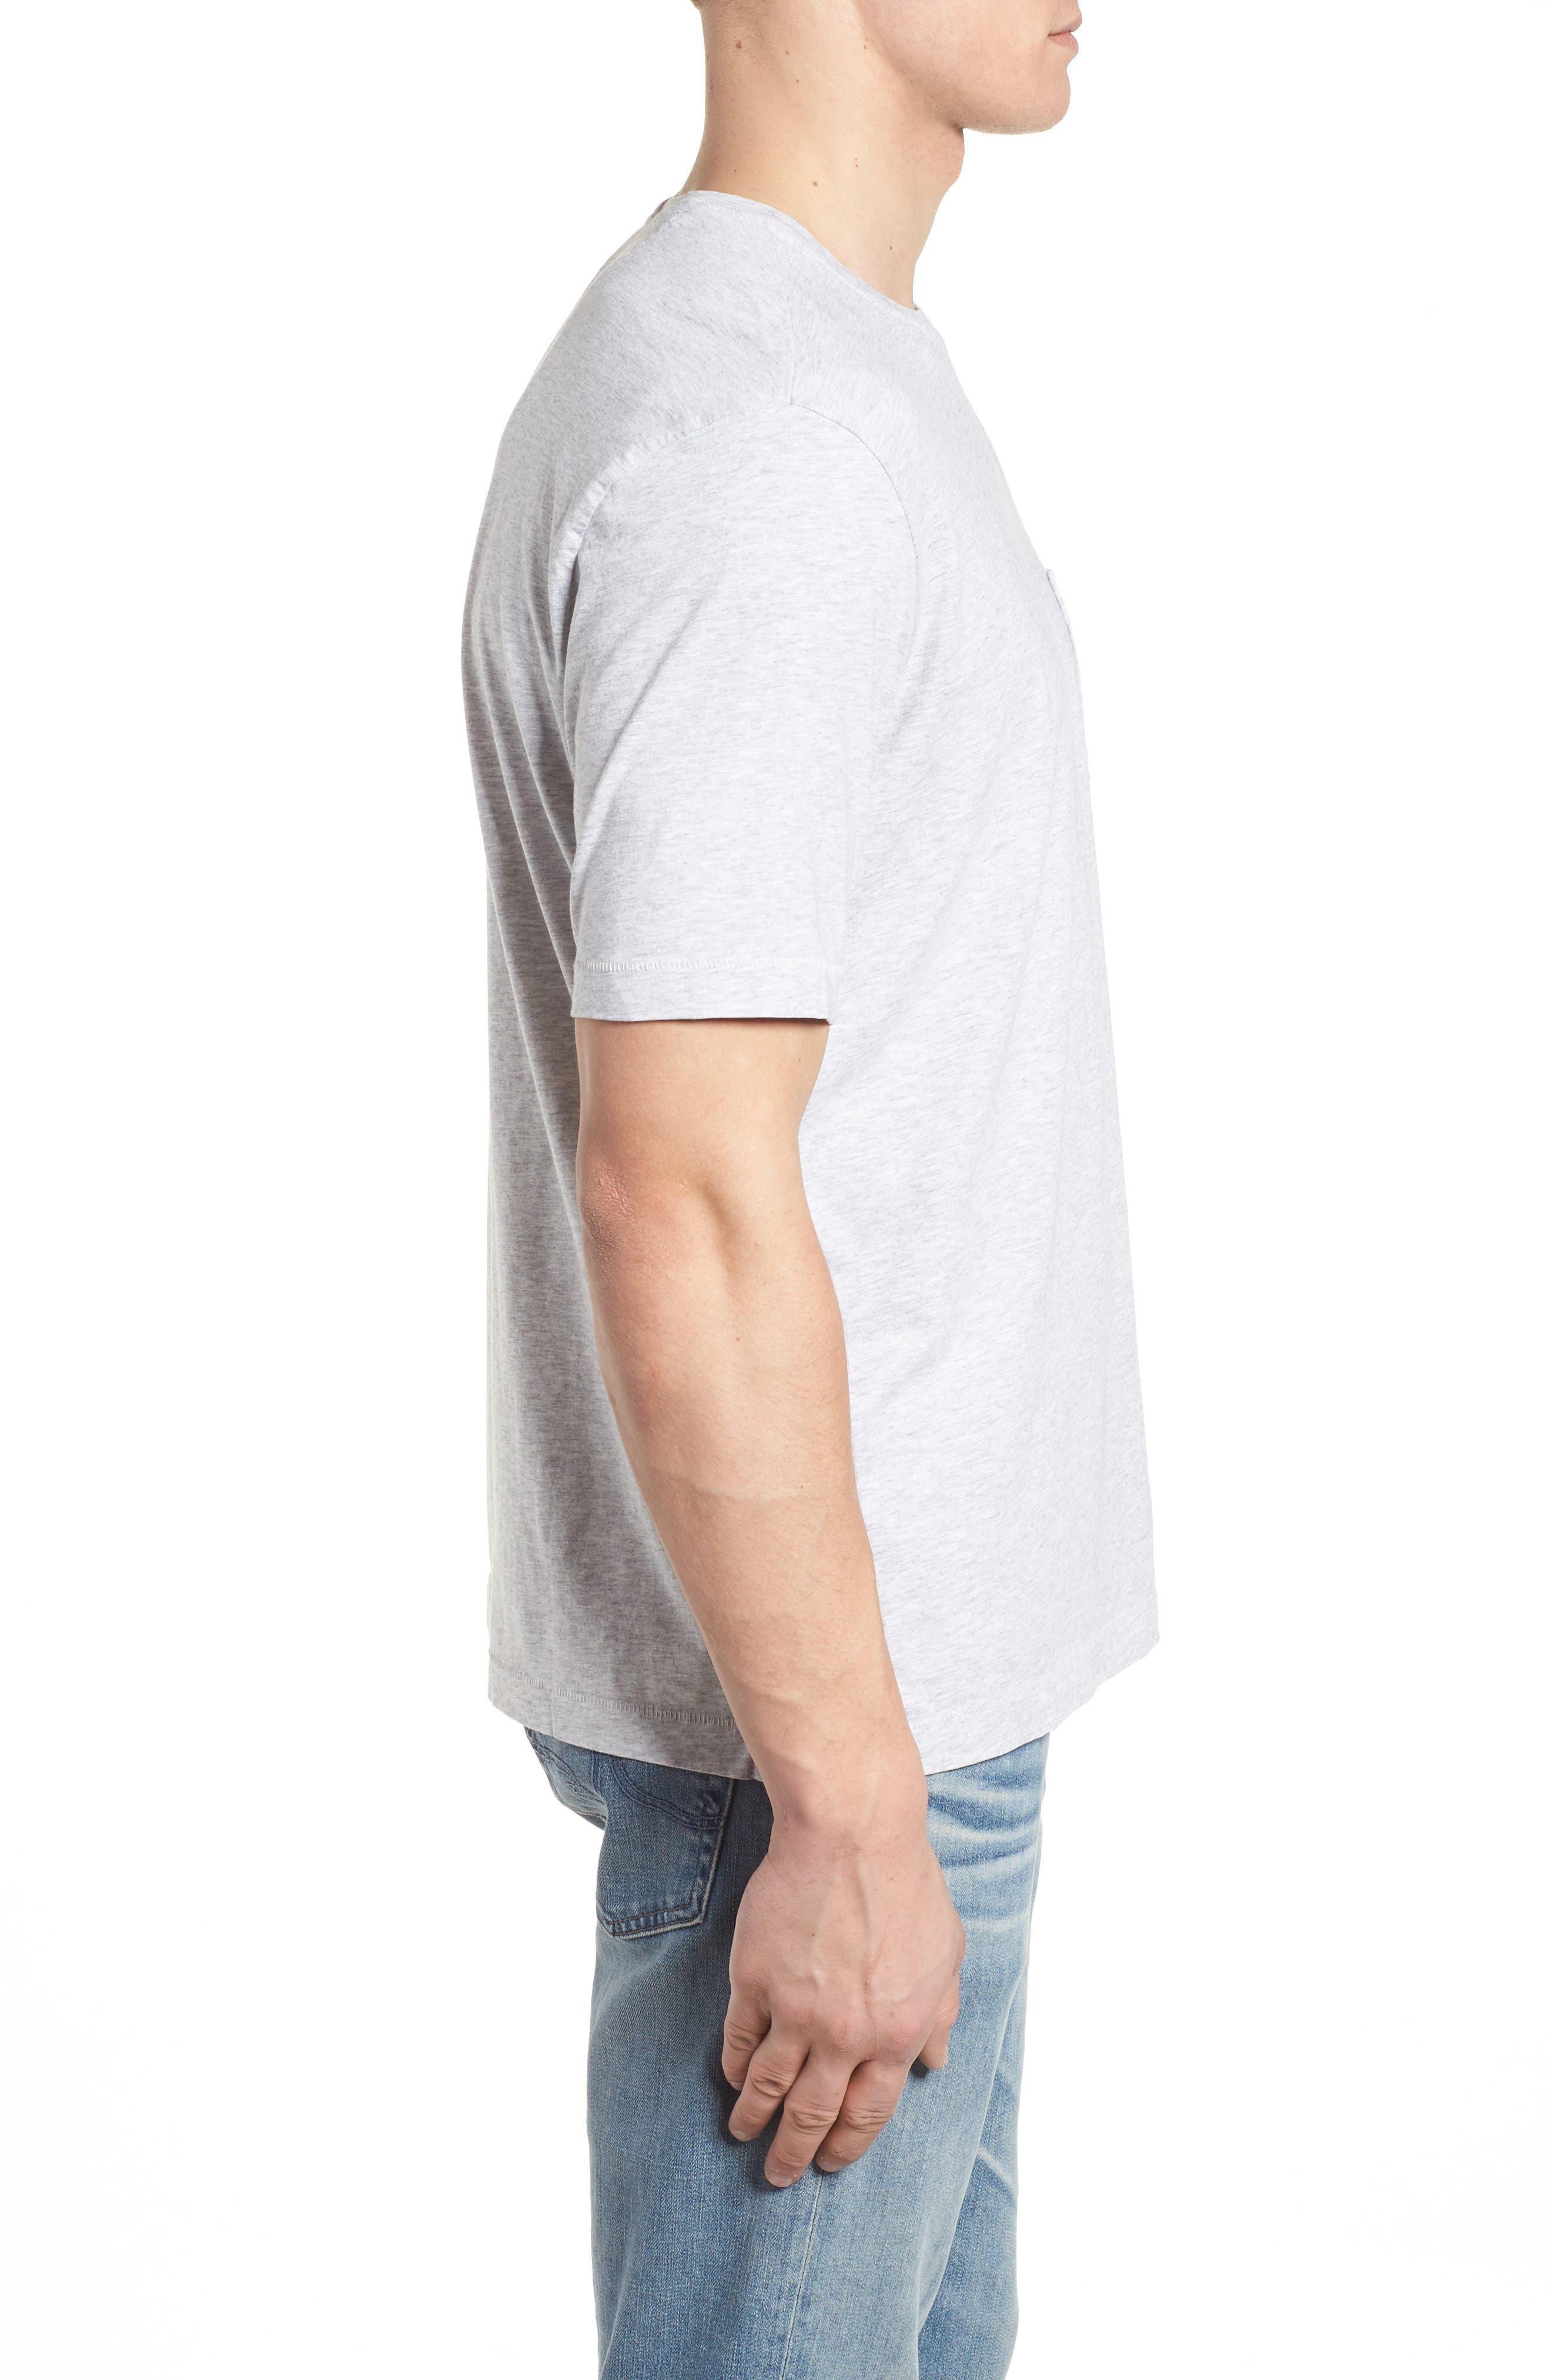 New Bali Skyline T-Shirt,                             Alternate thumbnail 3, color,                             Zinc Gray Heather